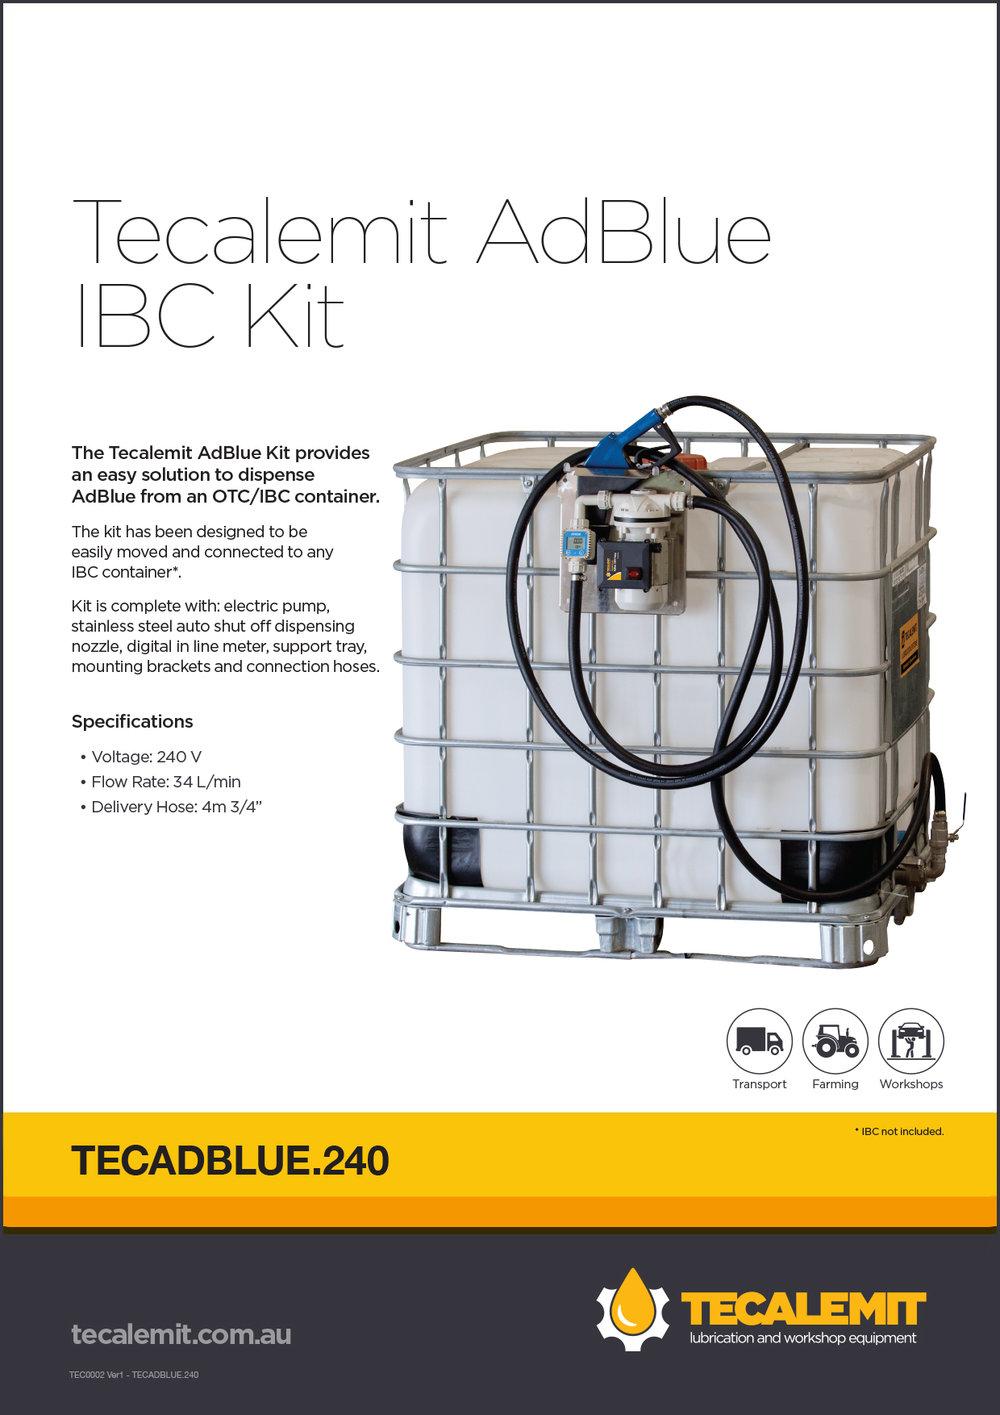 TECADBLUE.240 Product Info